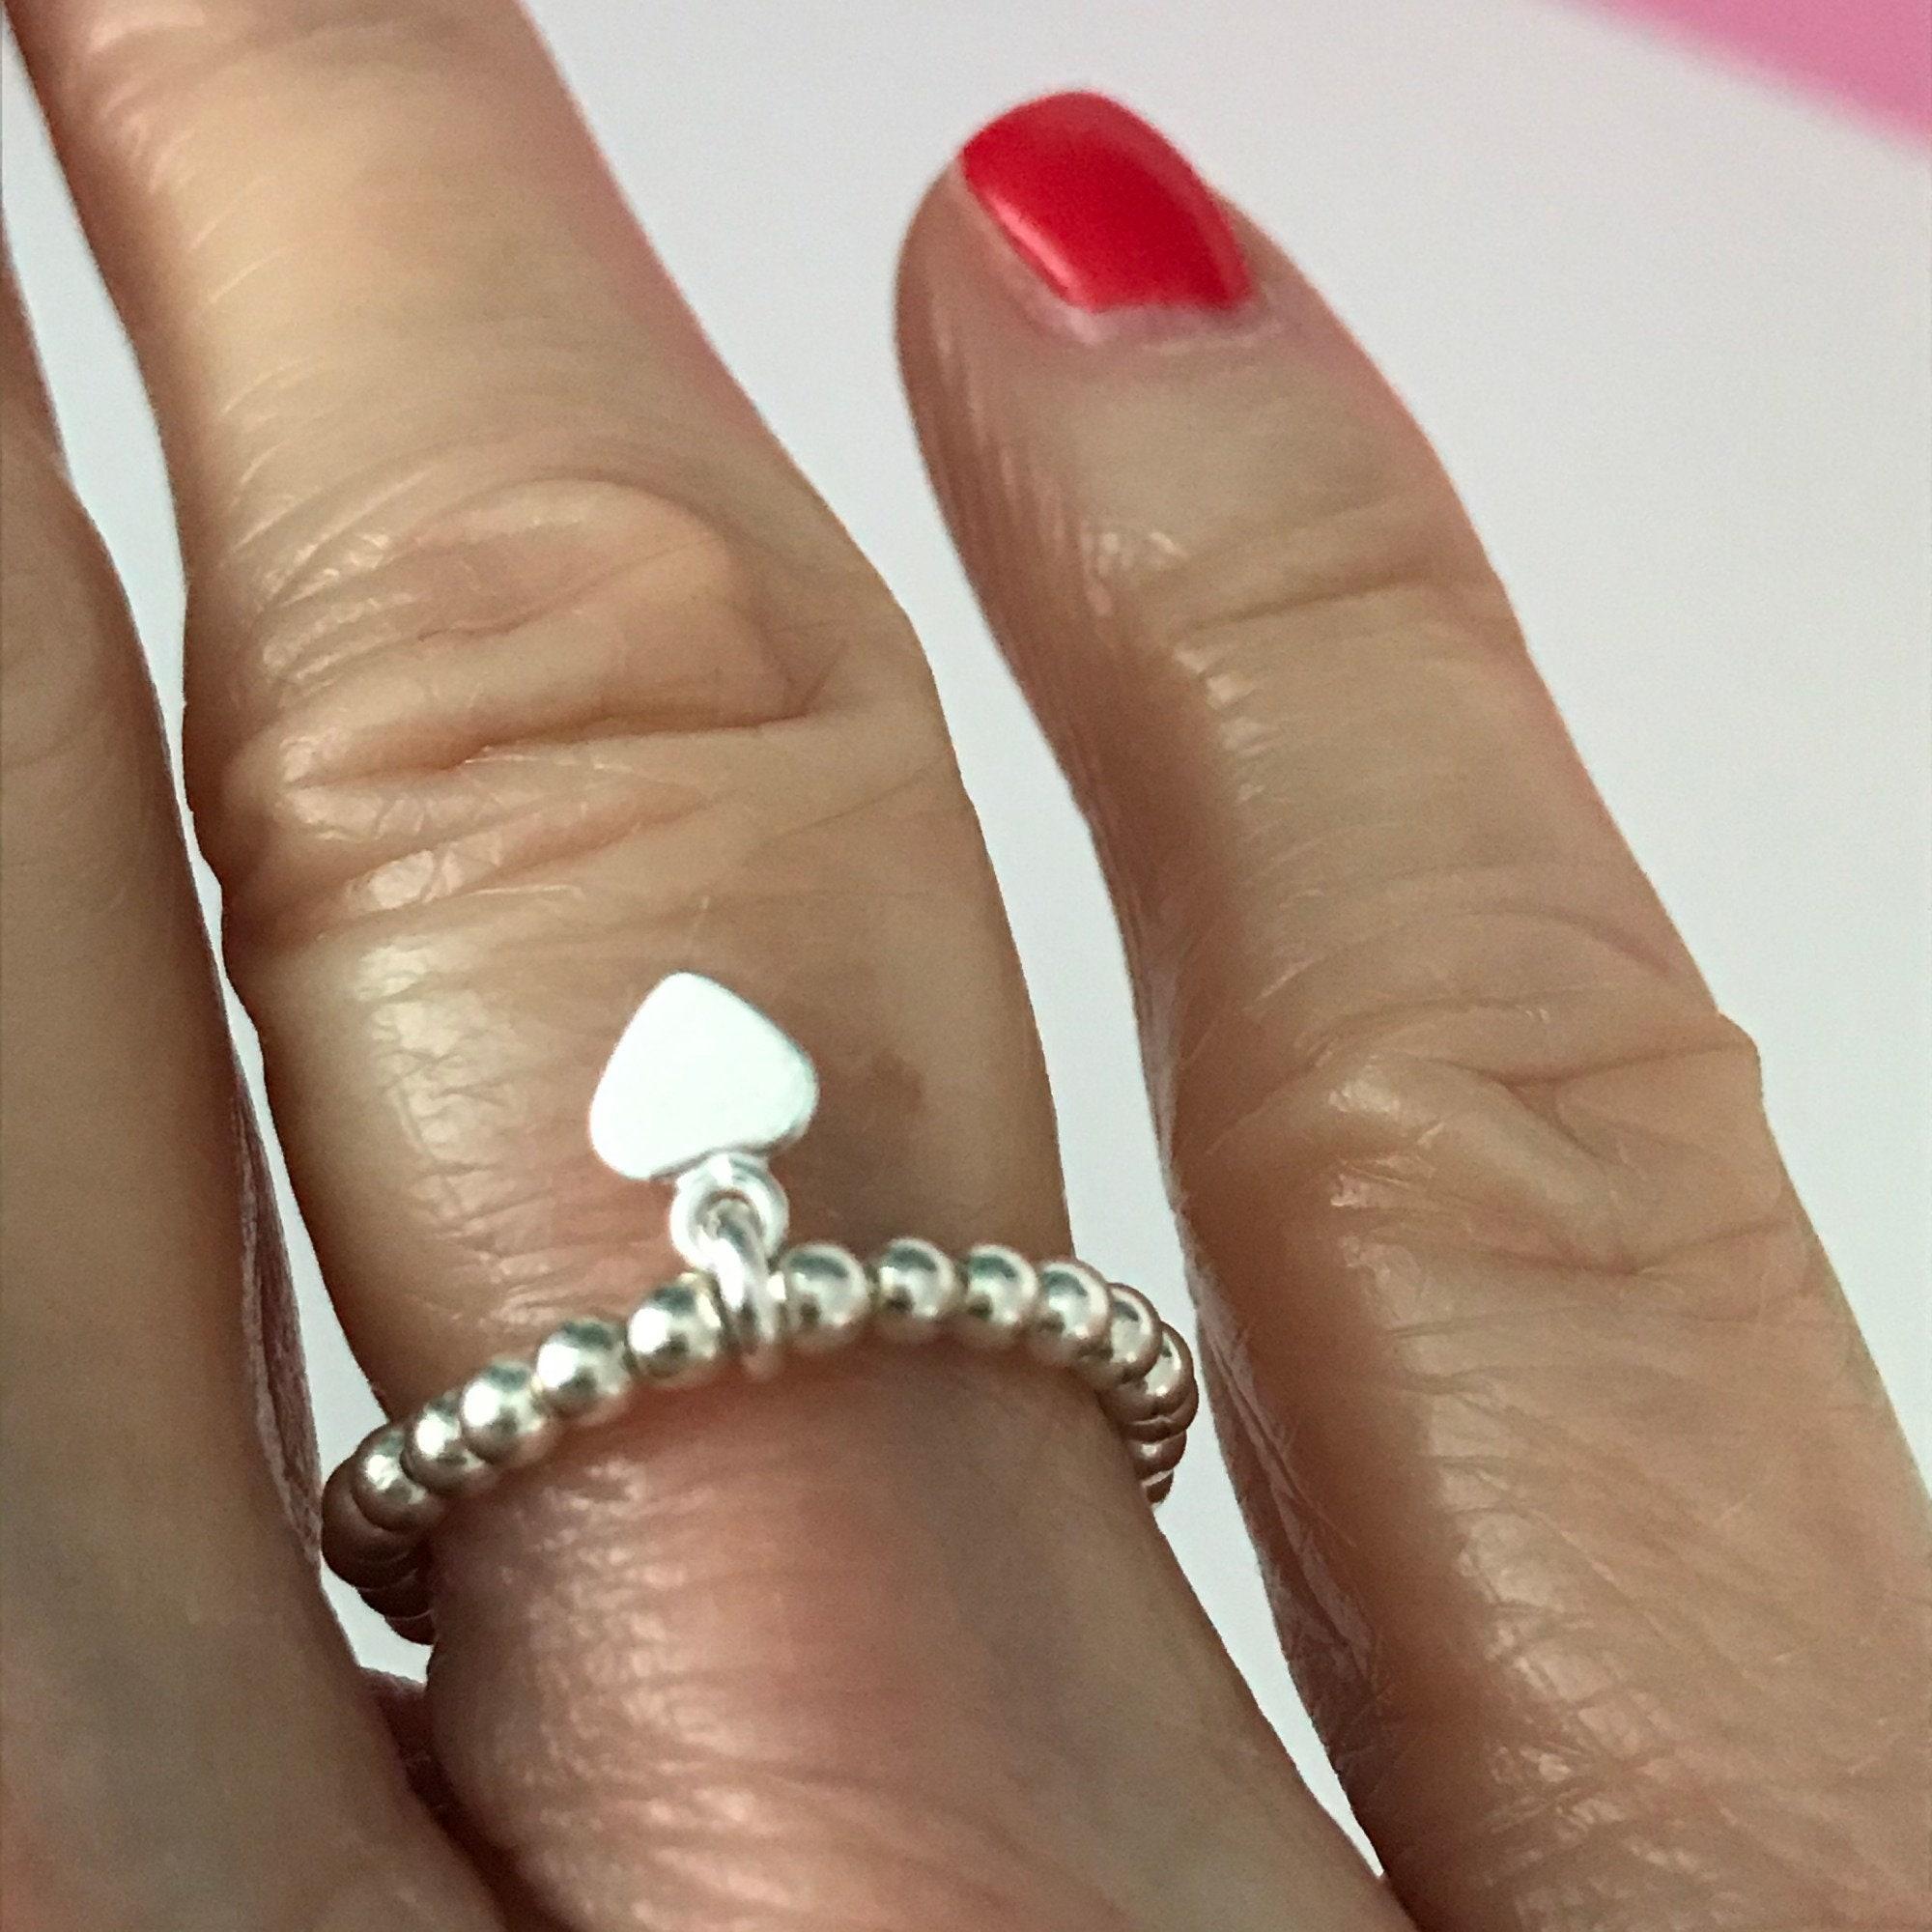 Sterling Silver Rings For Women Beaded Heart Charm Stacking Ring Uk Handmade Stretch Elastic Gift For Her 2 5mm Ball Beads